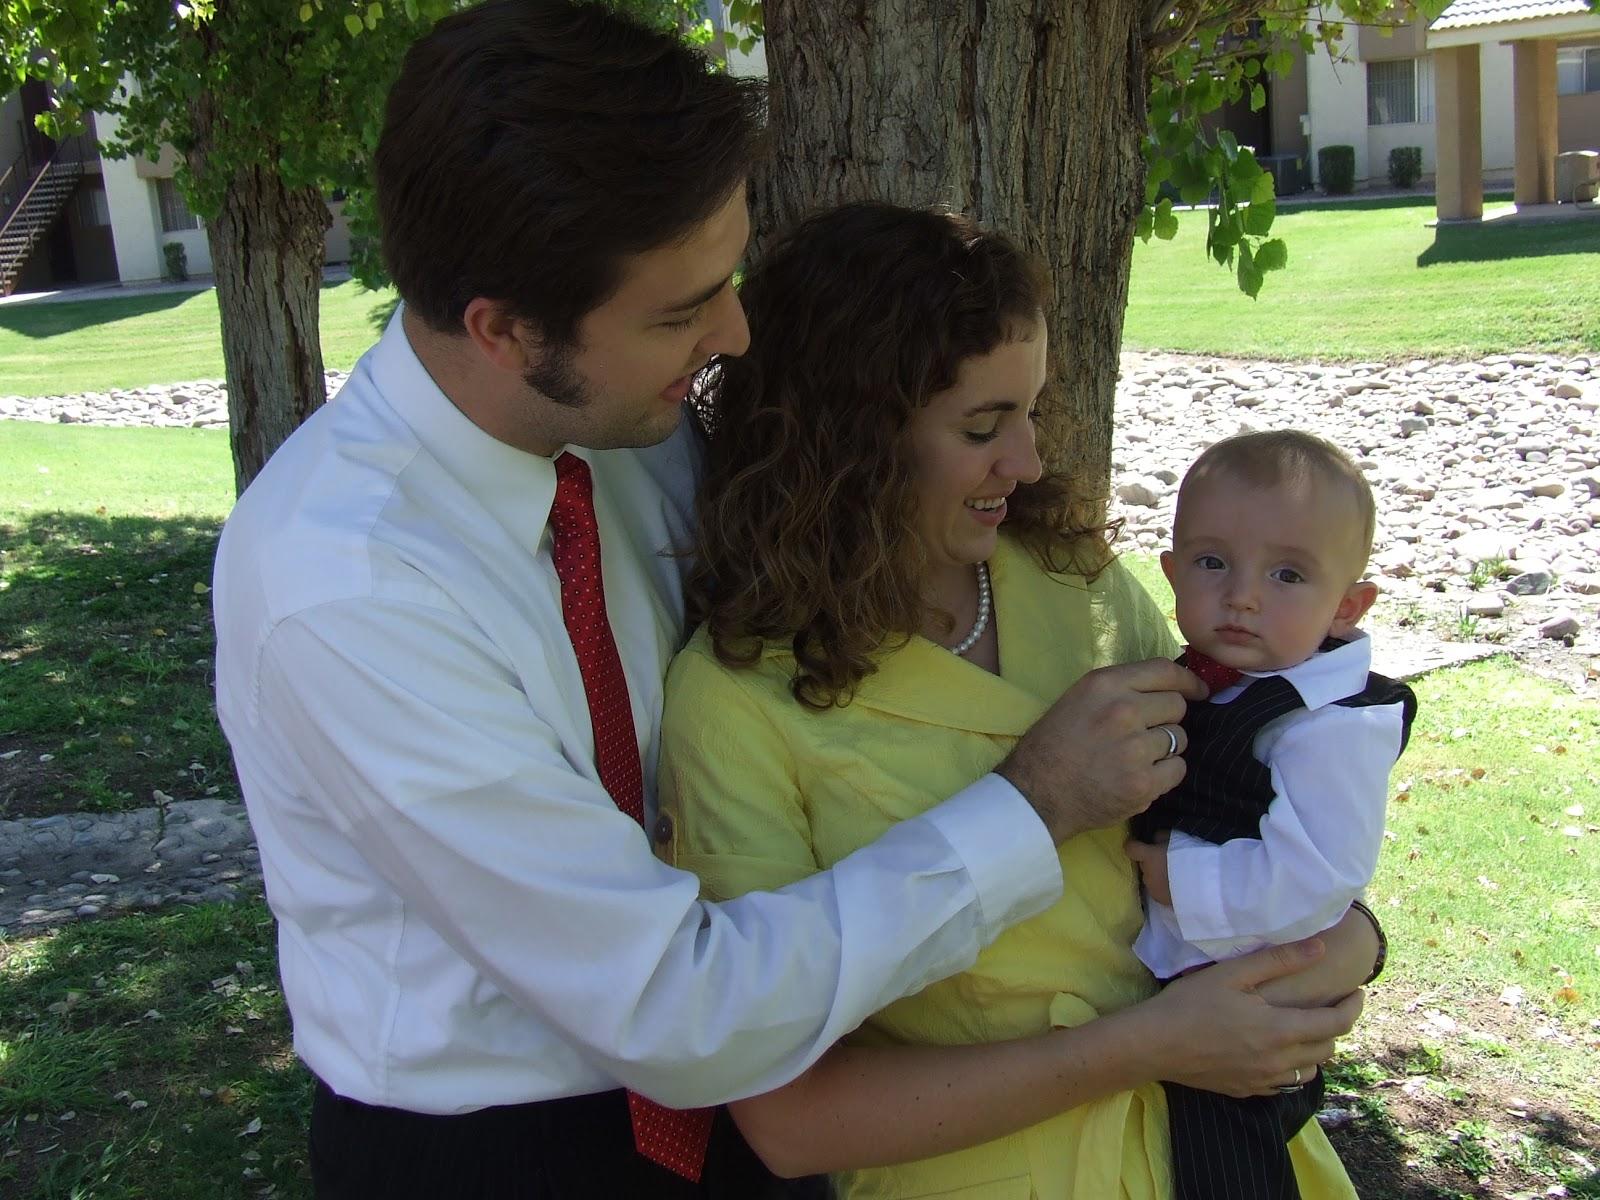 crush on a mormon